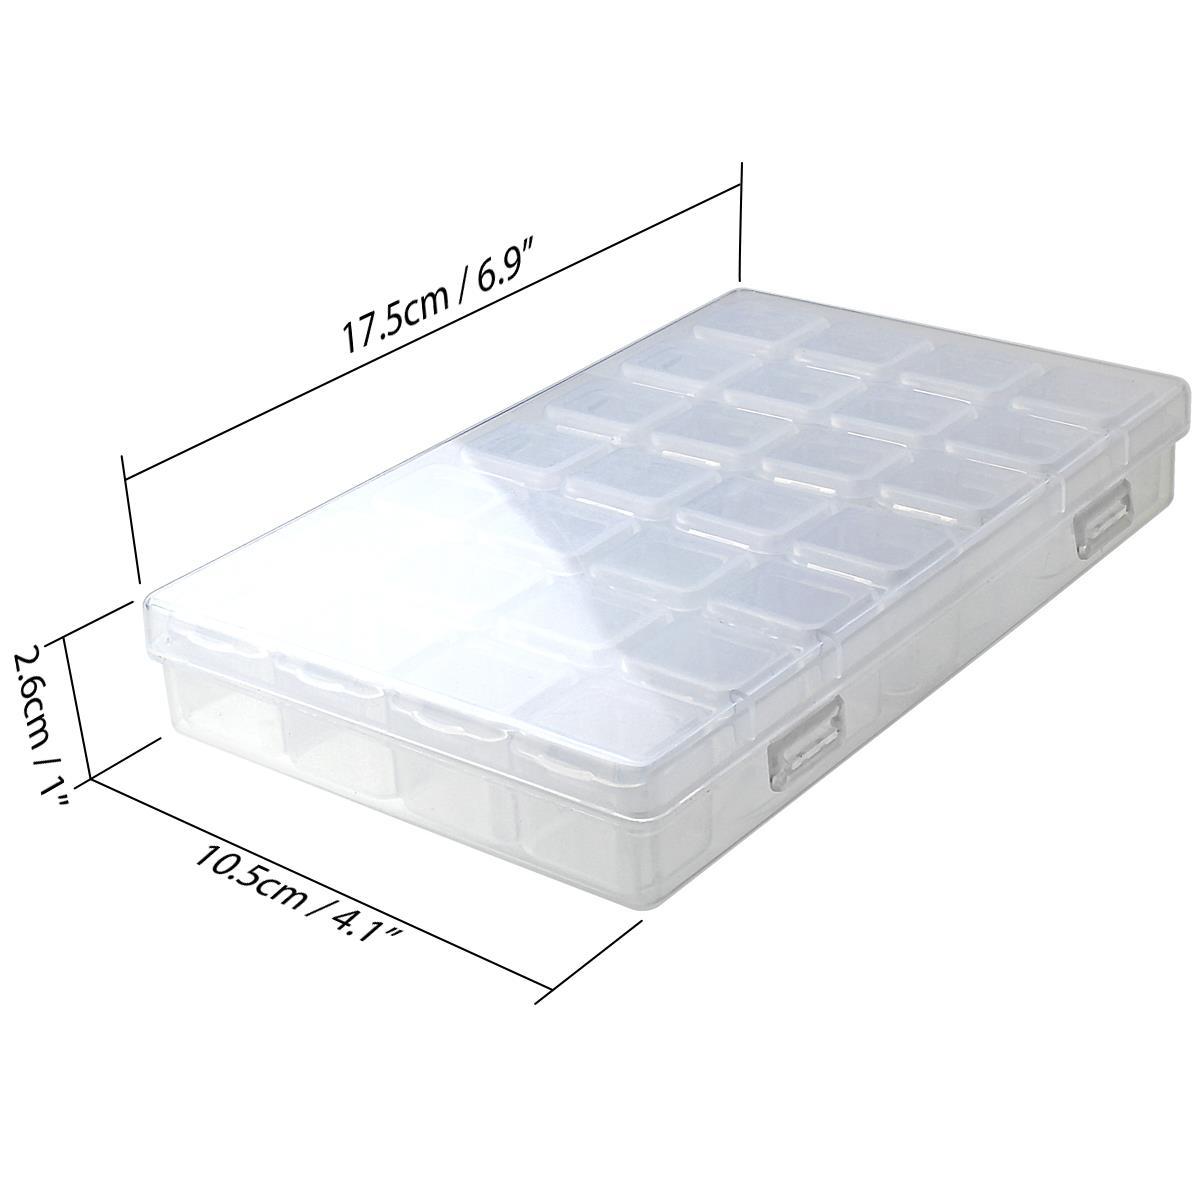 28-Diamond-Painting-Storage-Boxes-Bead-Organiser-Tray-Art-Beads-Embroidery-Case thumbnail 9